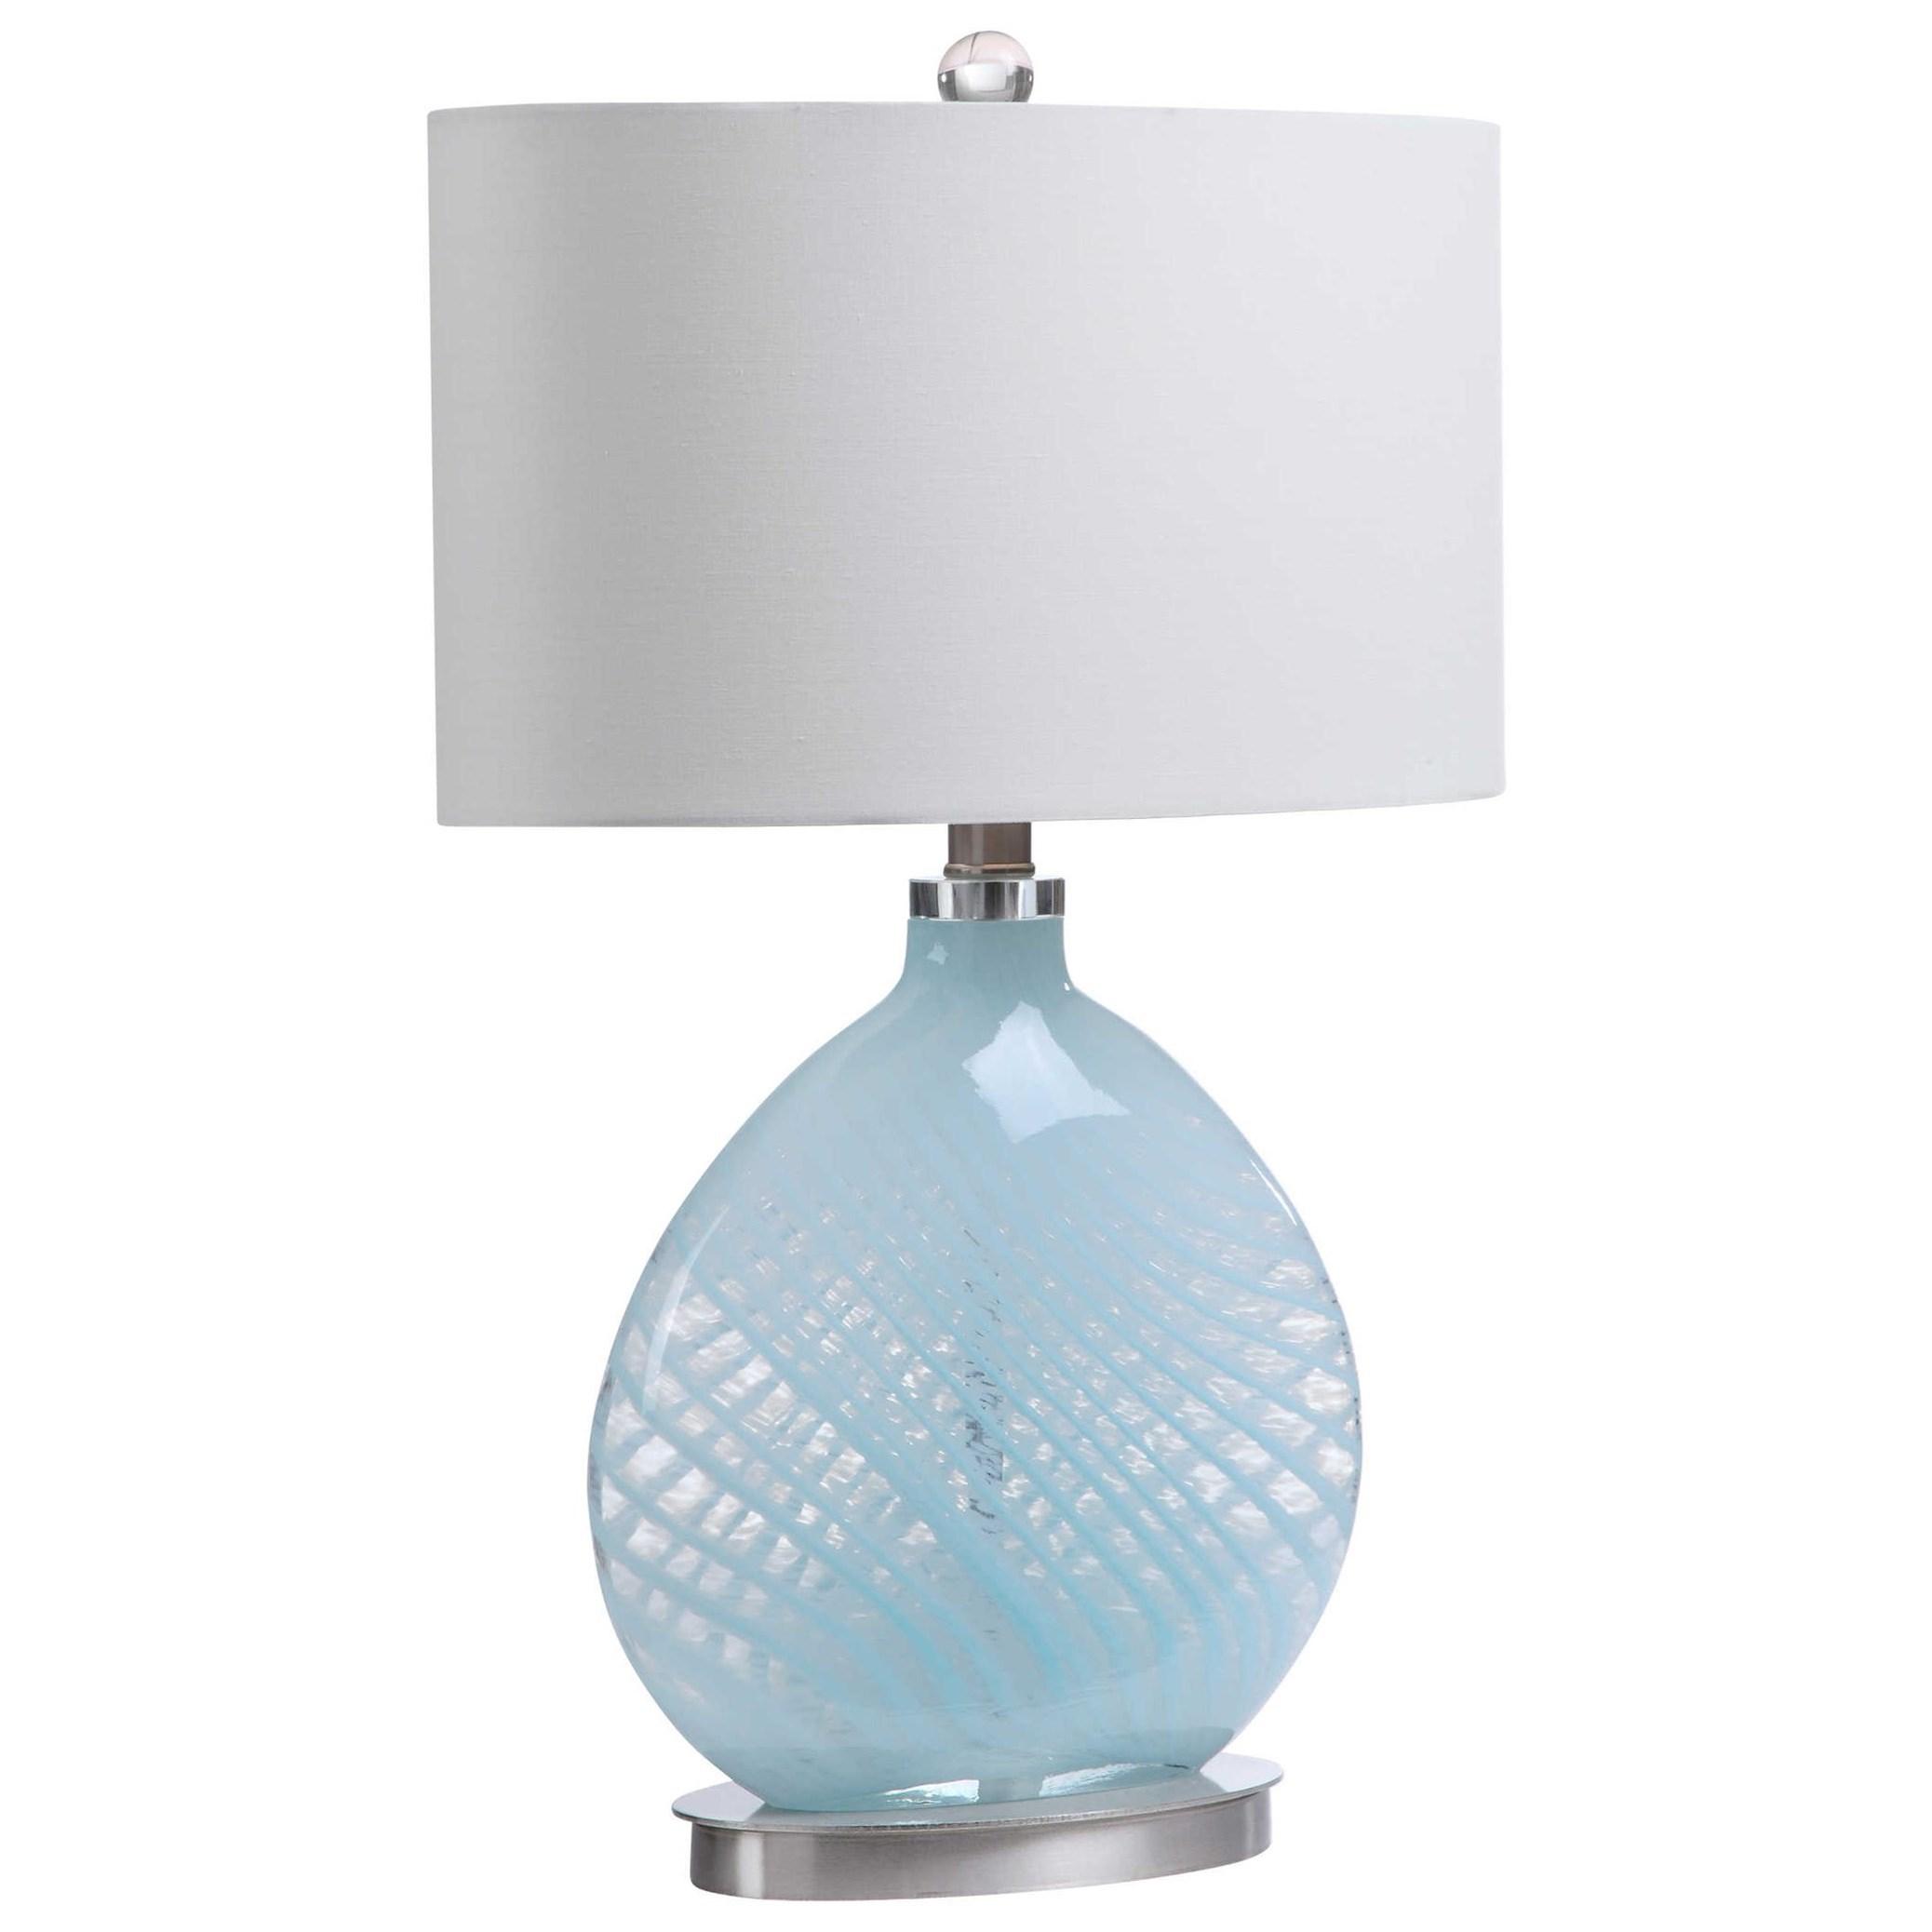 Aquata Glass Table Lamp